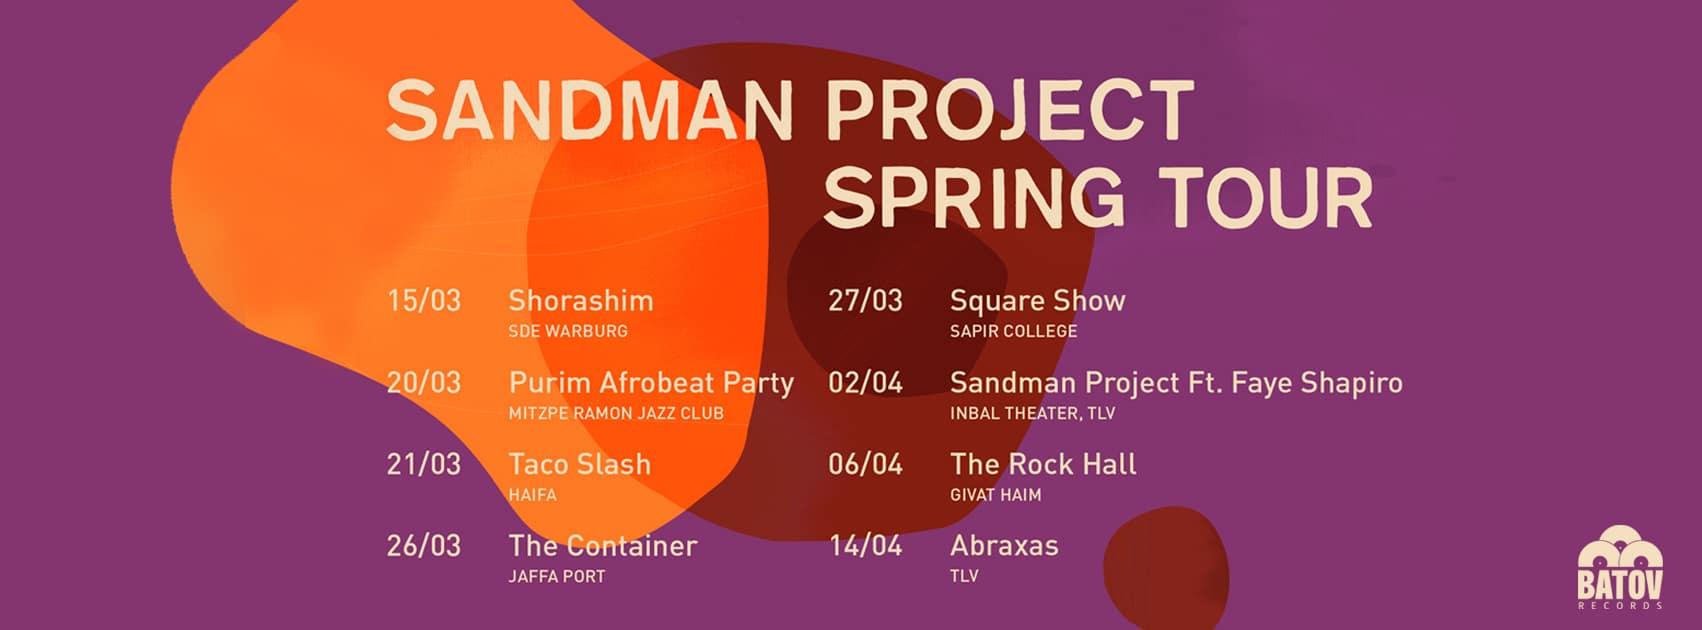 Sandman Project Spring Tour 2019 1